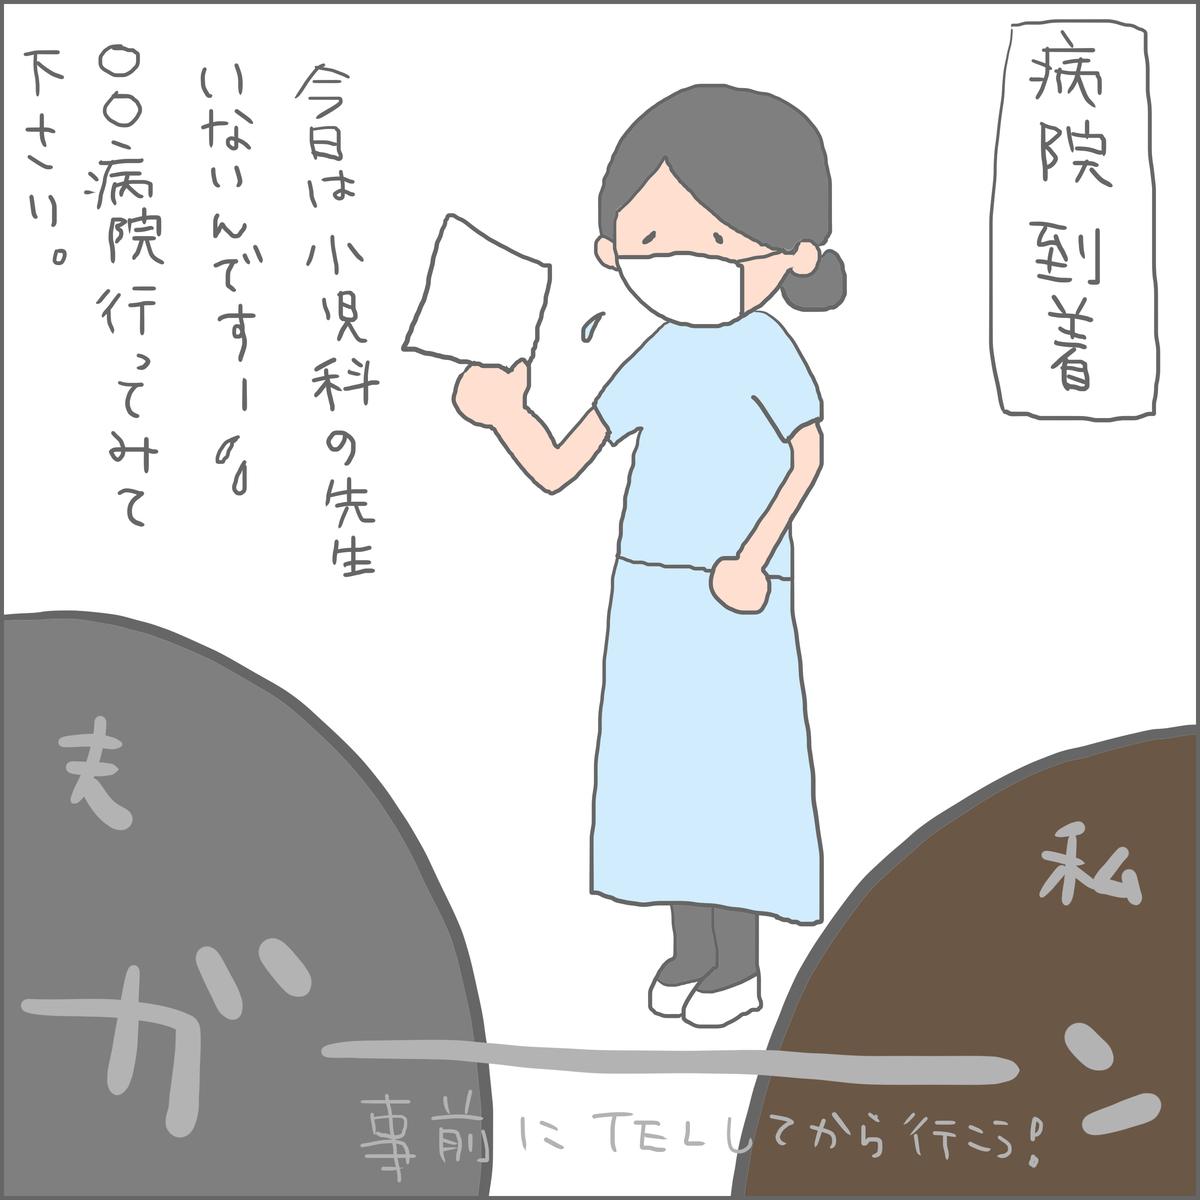 f:id:ika_yoshi:20210606010648j:plain